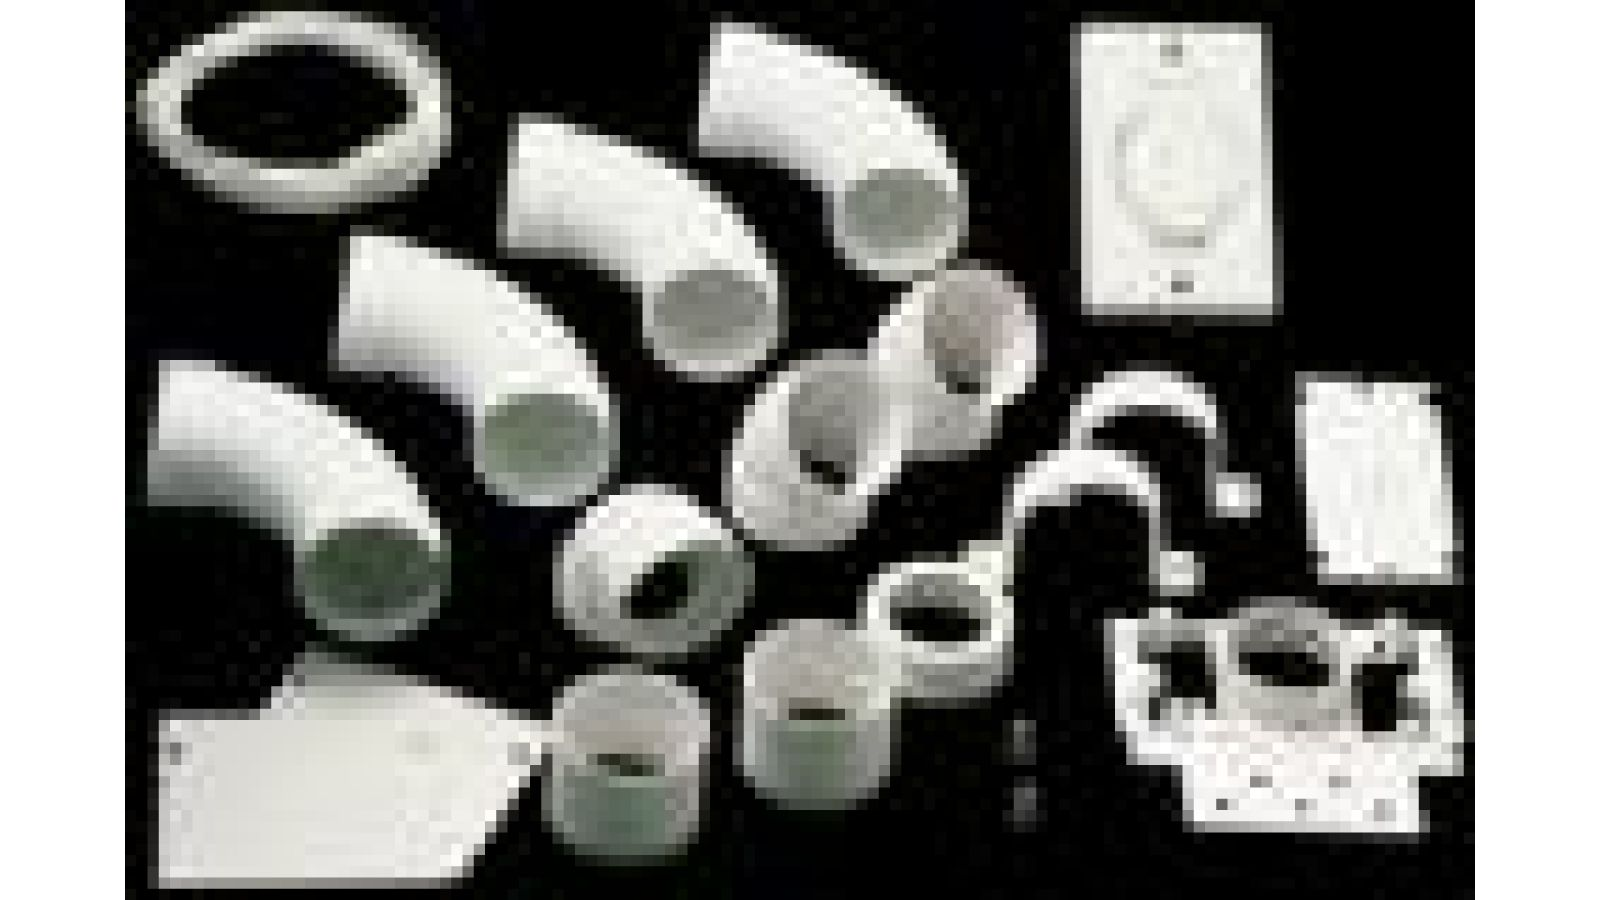 CVS306 & CVS307 - Single Inlet Kits